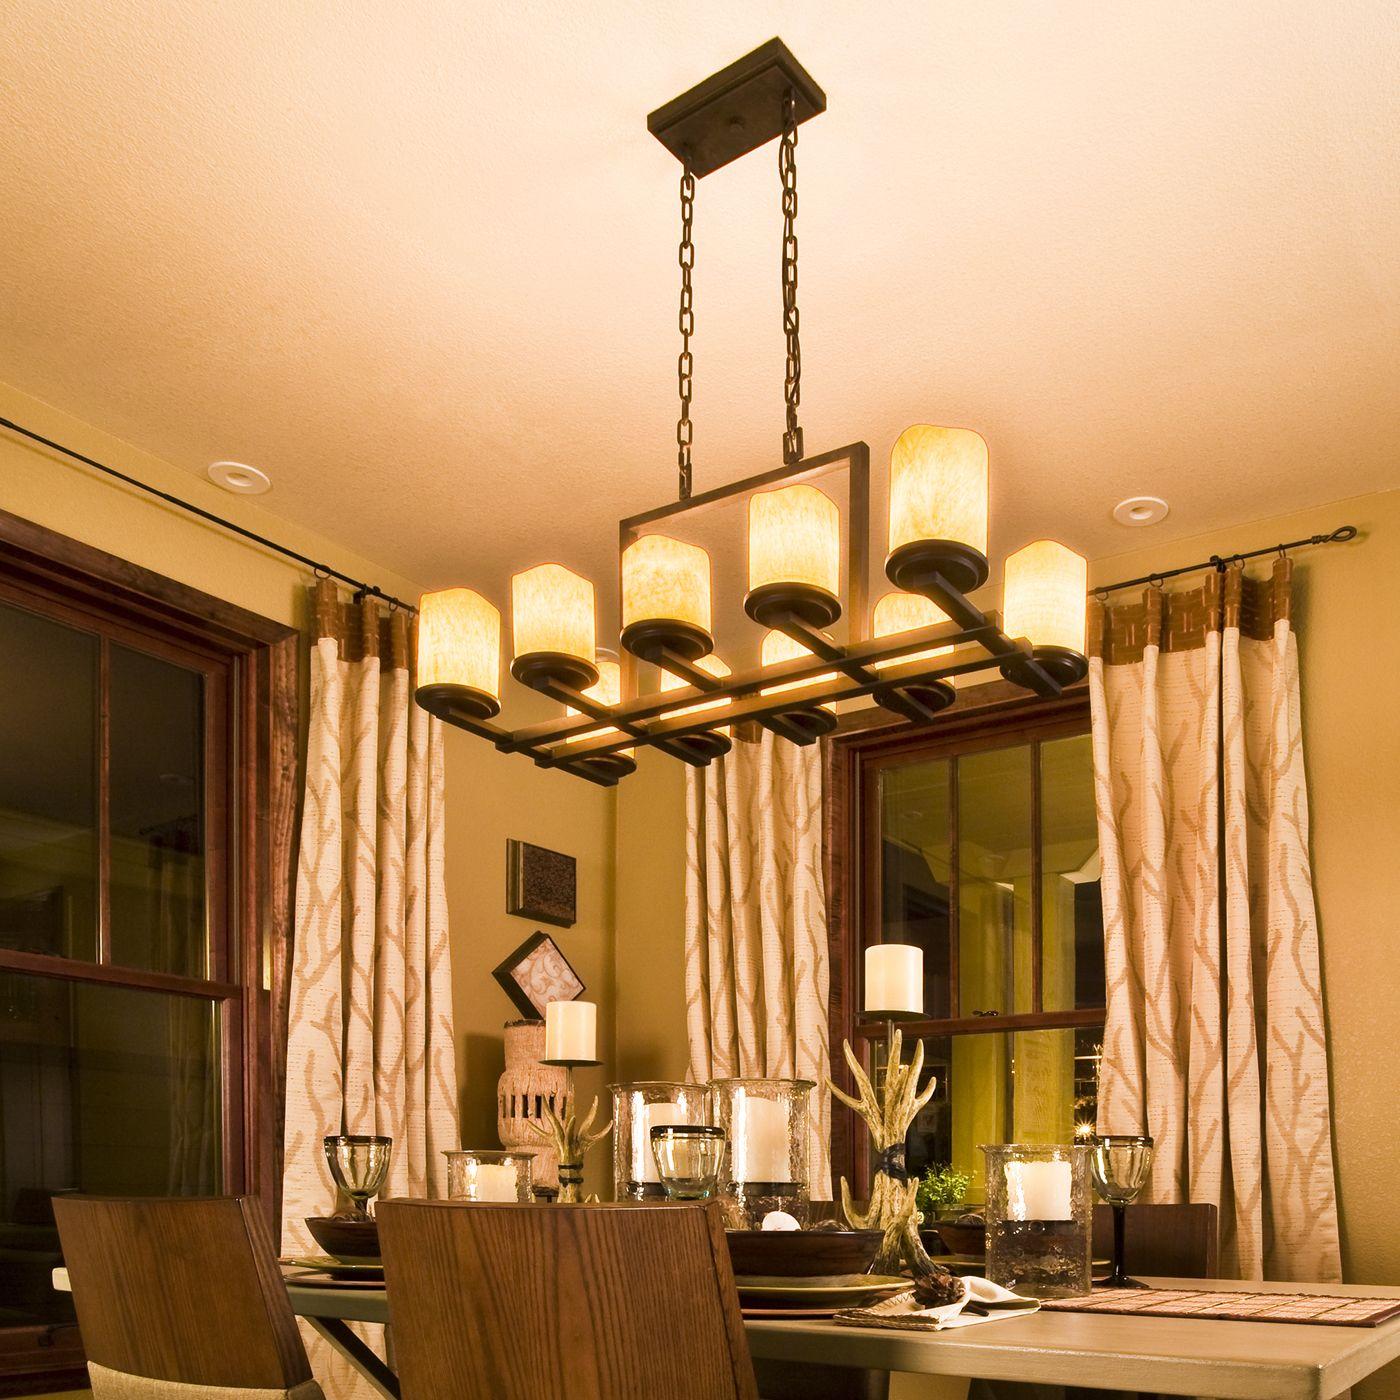 Maxim lighting 21149scre 10 light luminous rectangular chandelier at maxim lighting 21149scre 10 light luminous rectangular chandelier at atg stores mozeypictures Images